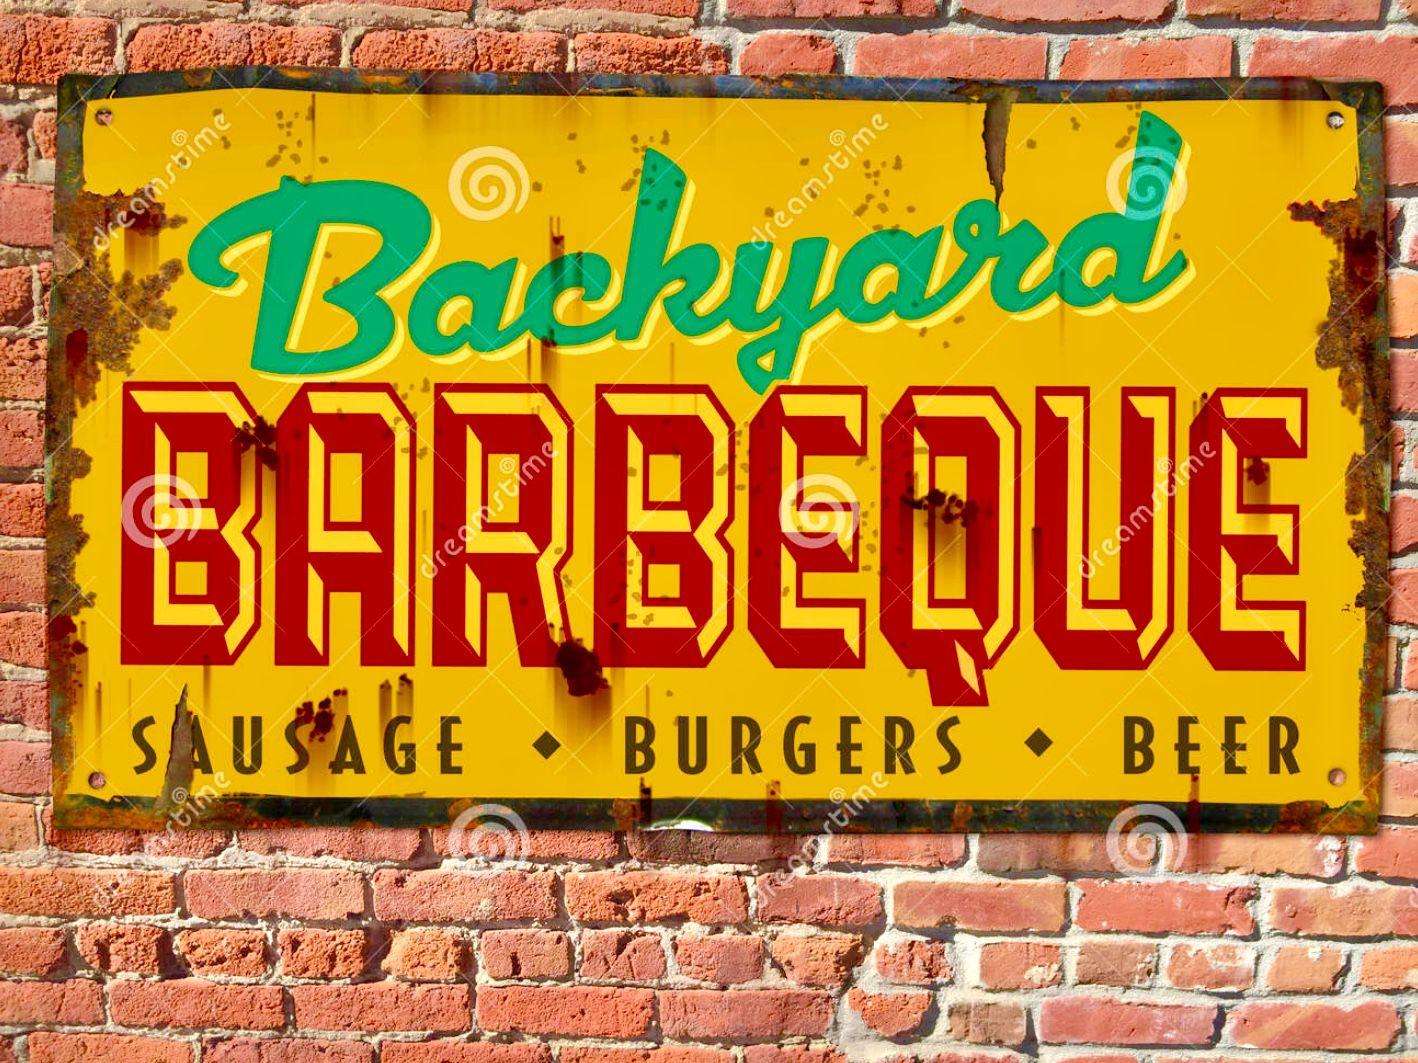 10+ Backyard Bbq Arlington Va Background - HomeLooker